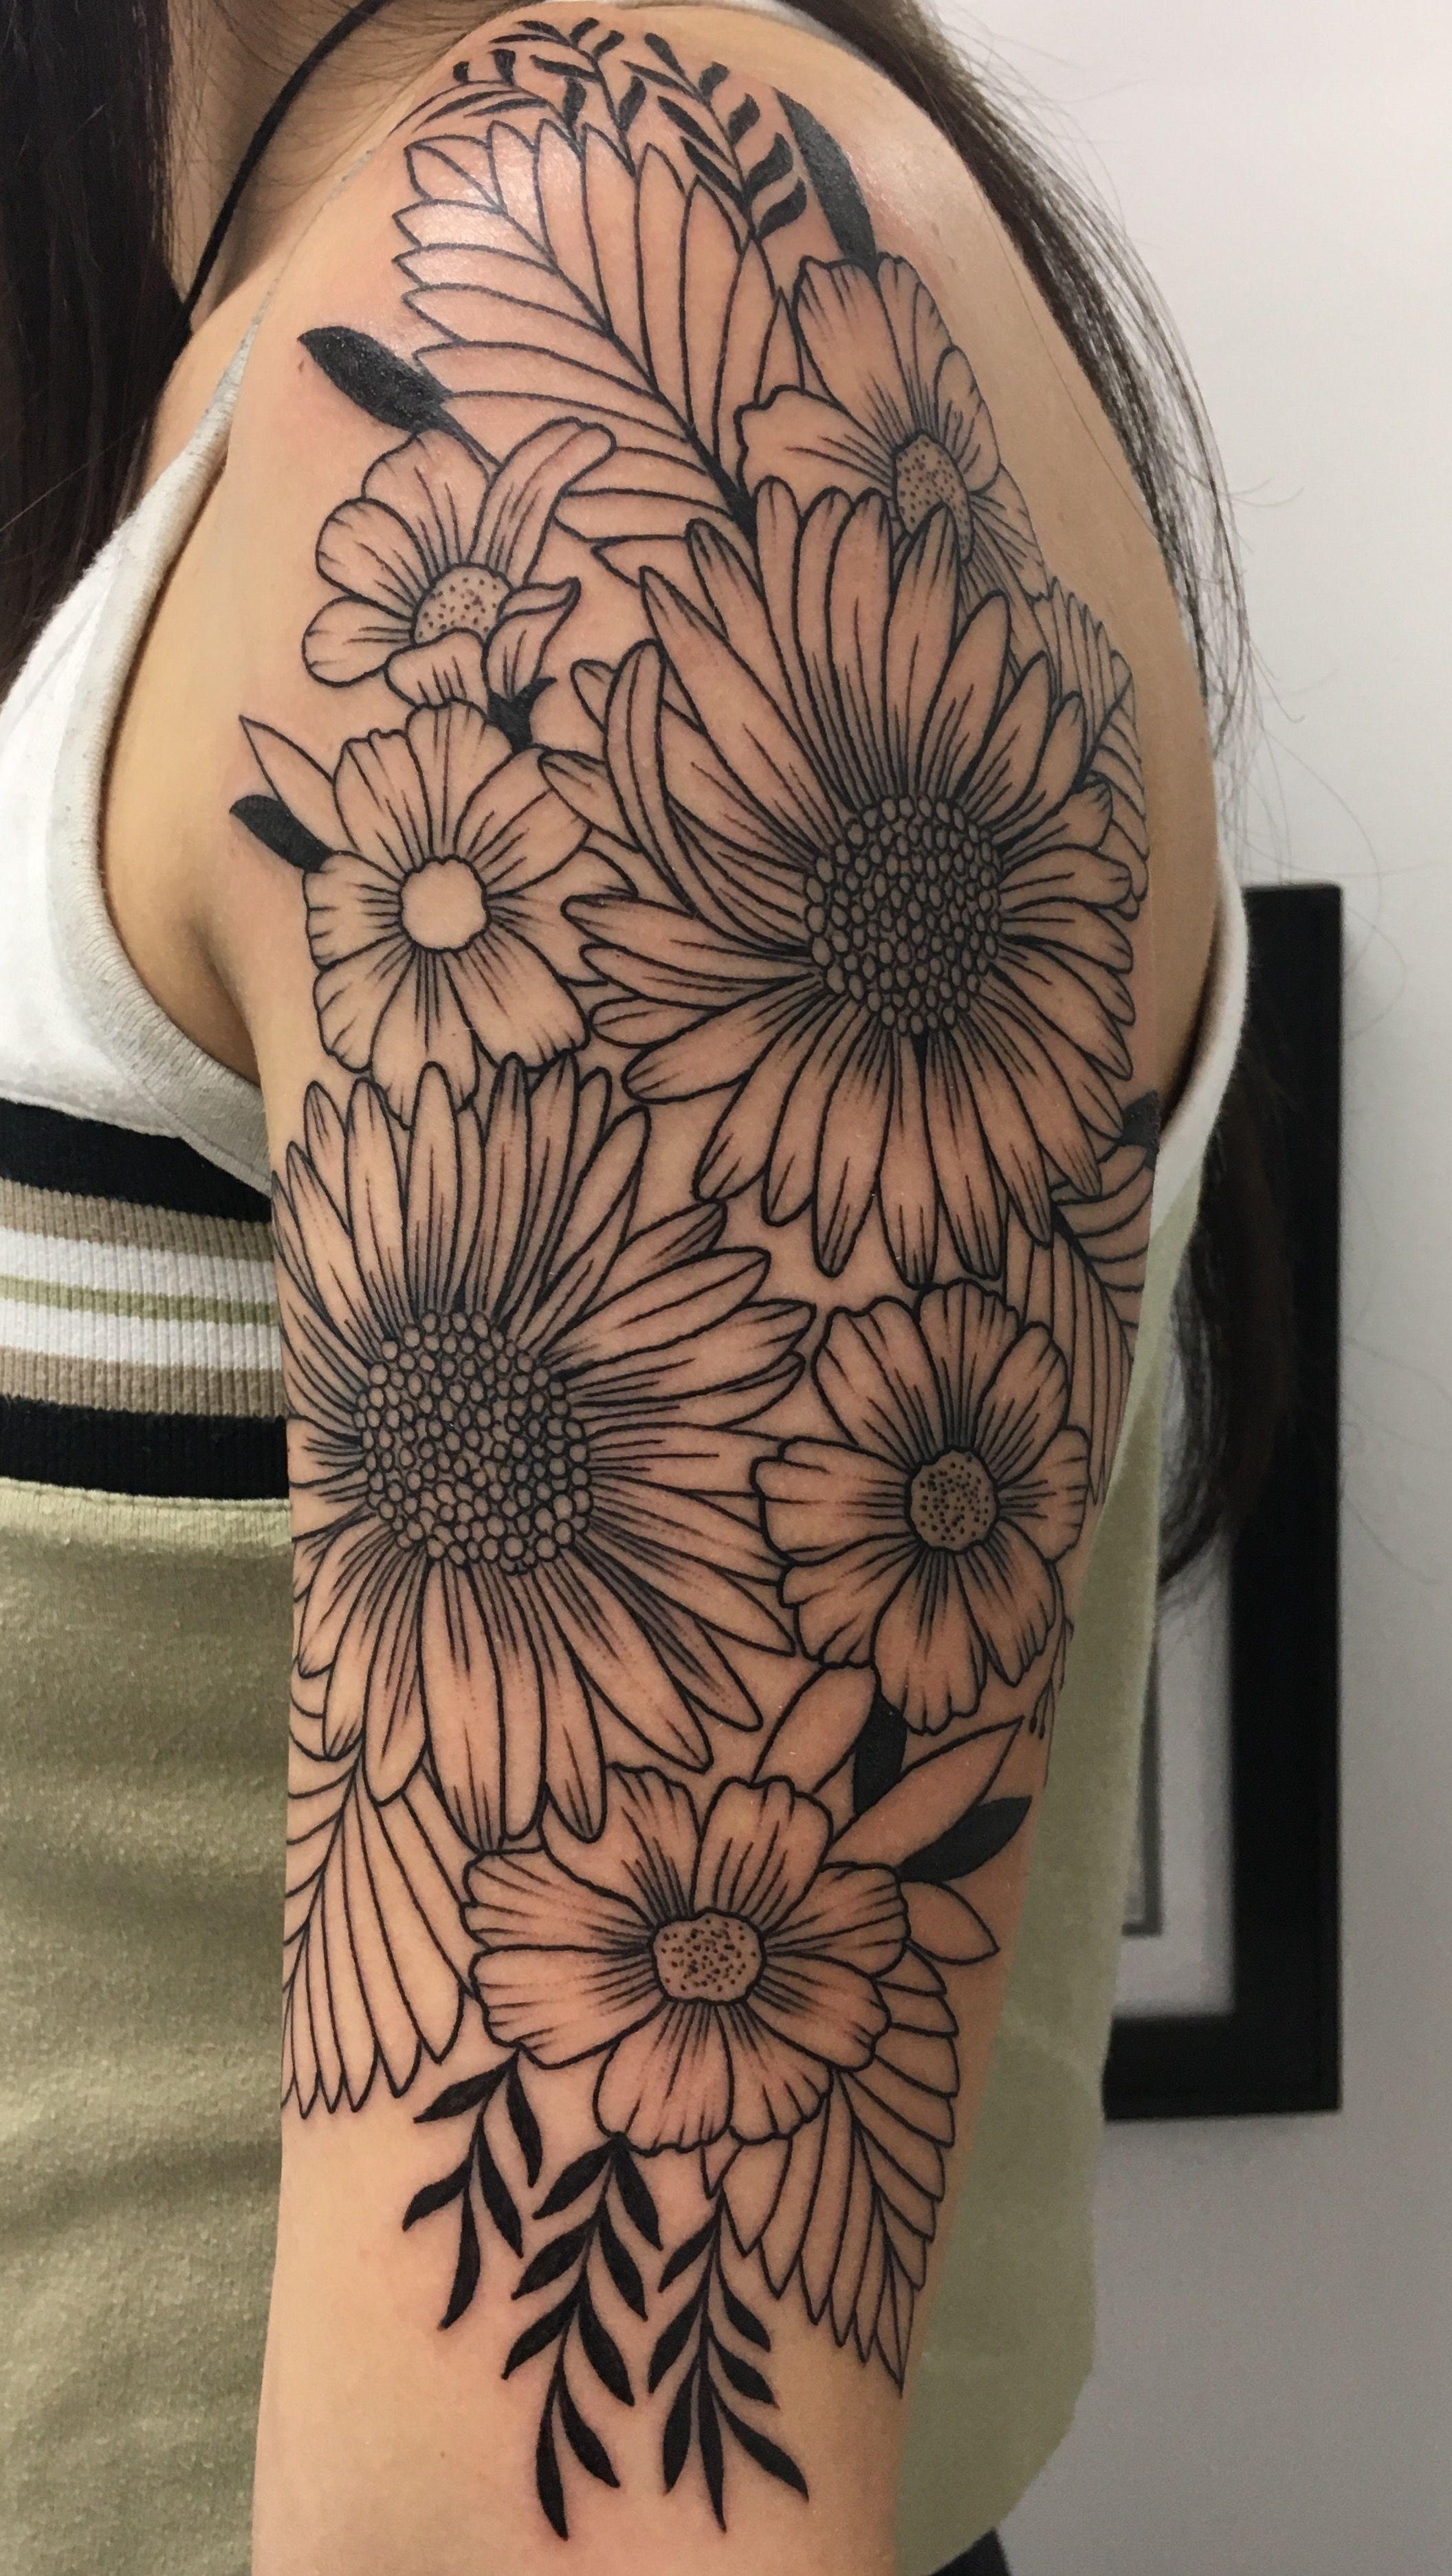 number 4 half sleeve wildflower tattoo , took about 3 1/2